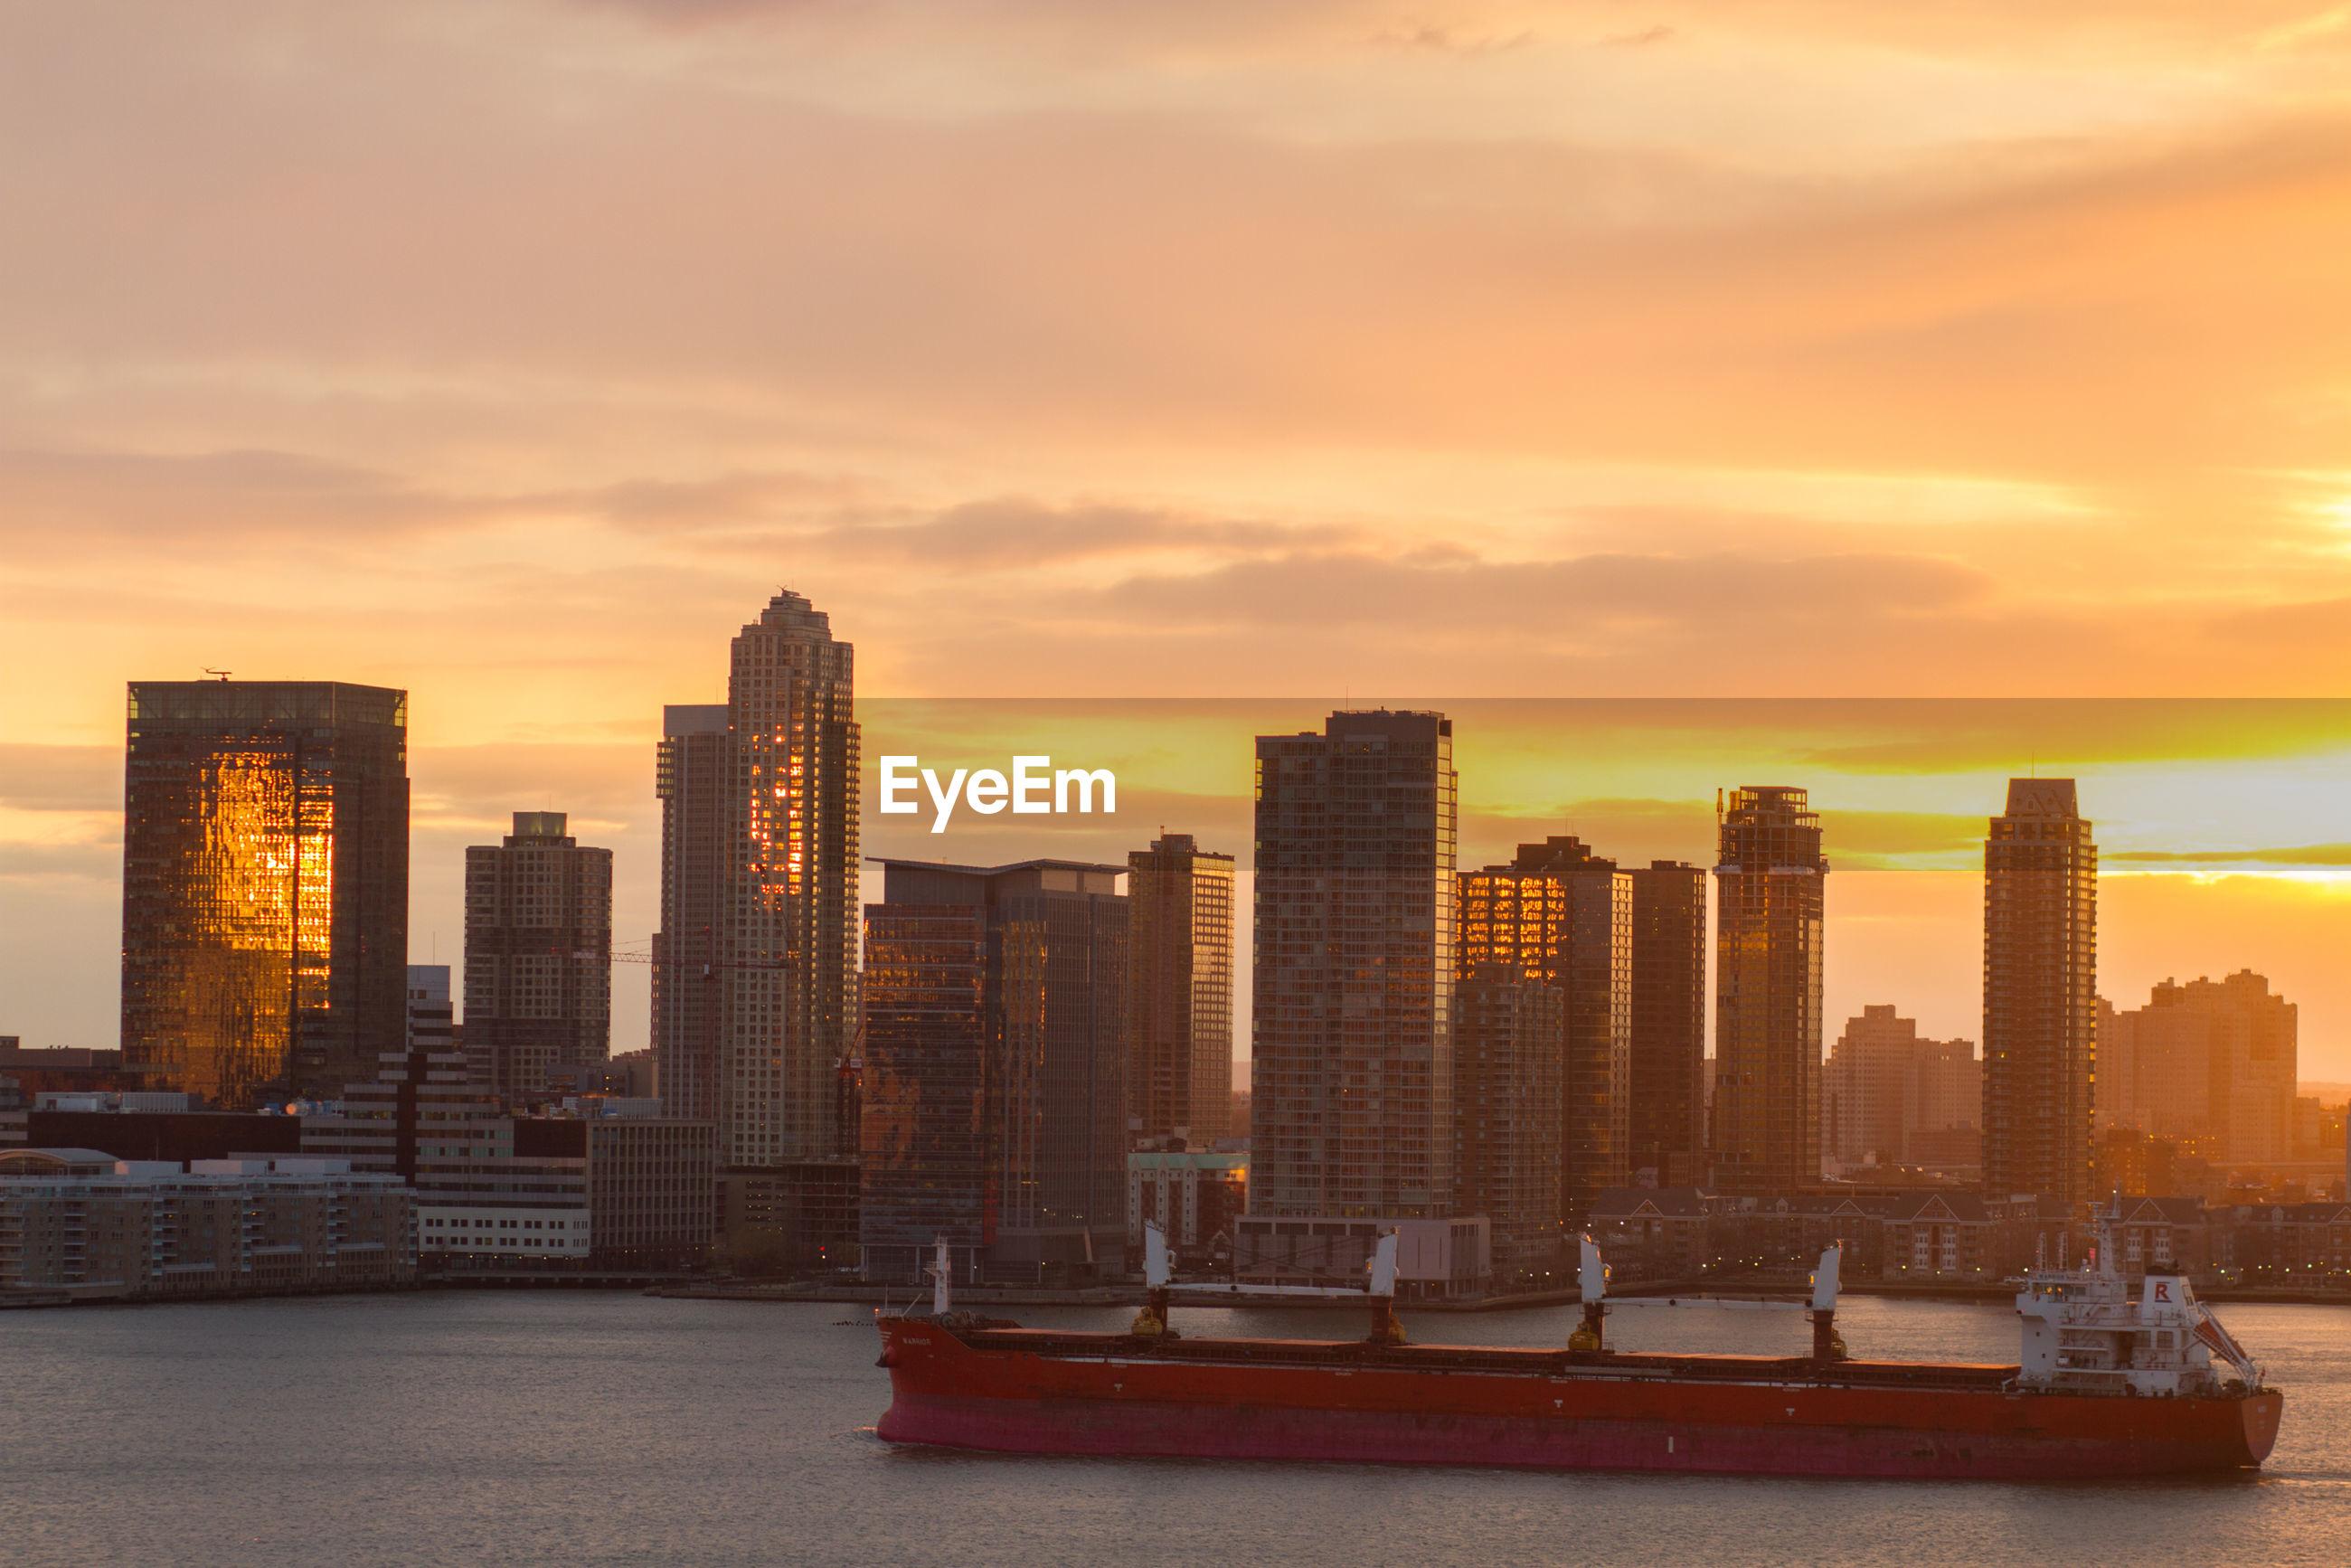 city, architecture, building exterior, sunset, skyscraper, built structure, urban skyline, cityscape, orange color, outdoors, modern, travel destinations, no people, sky, day